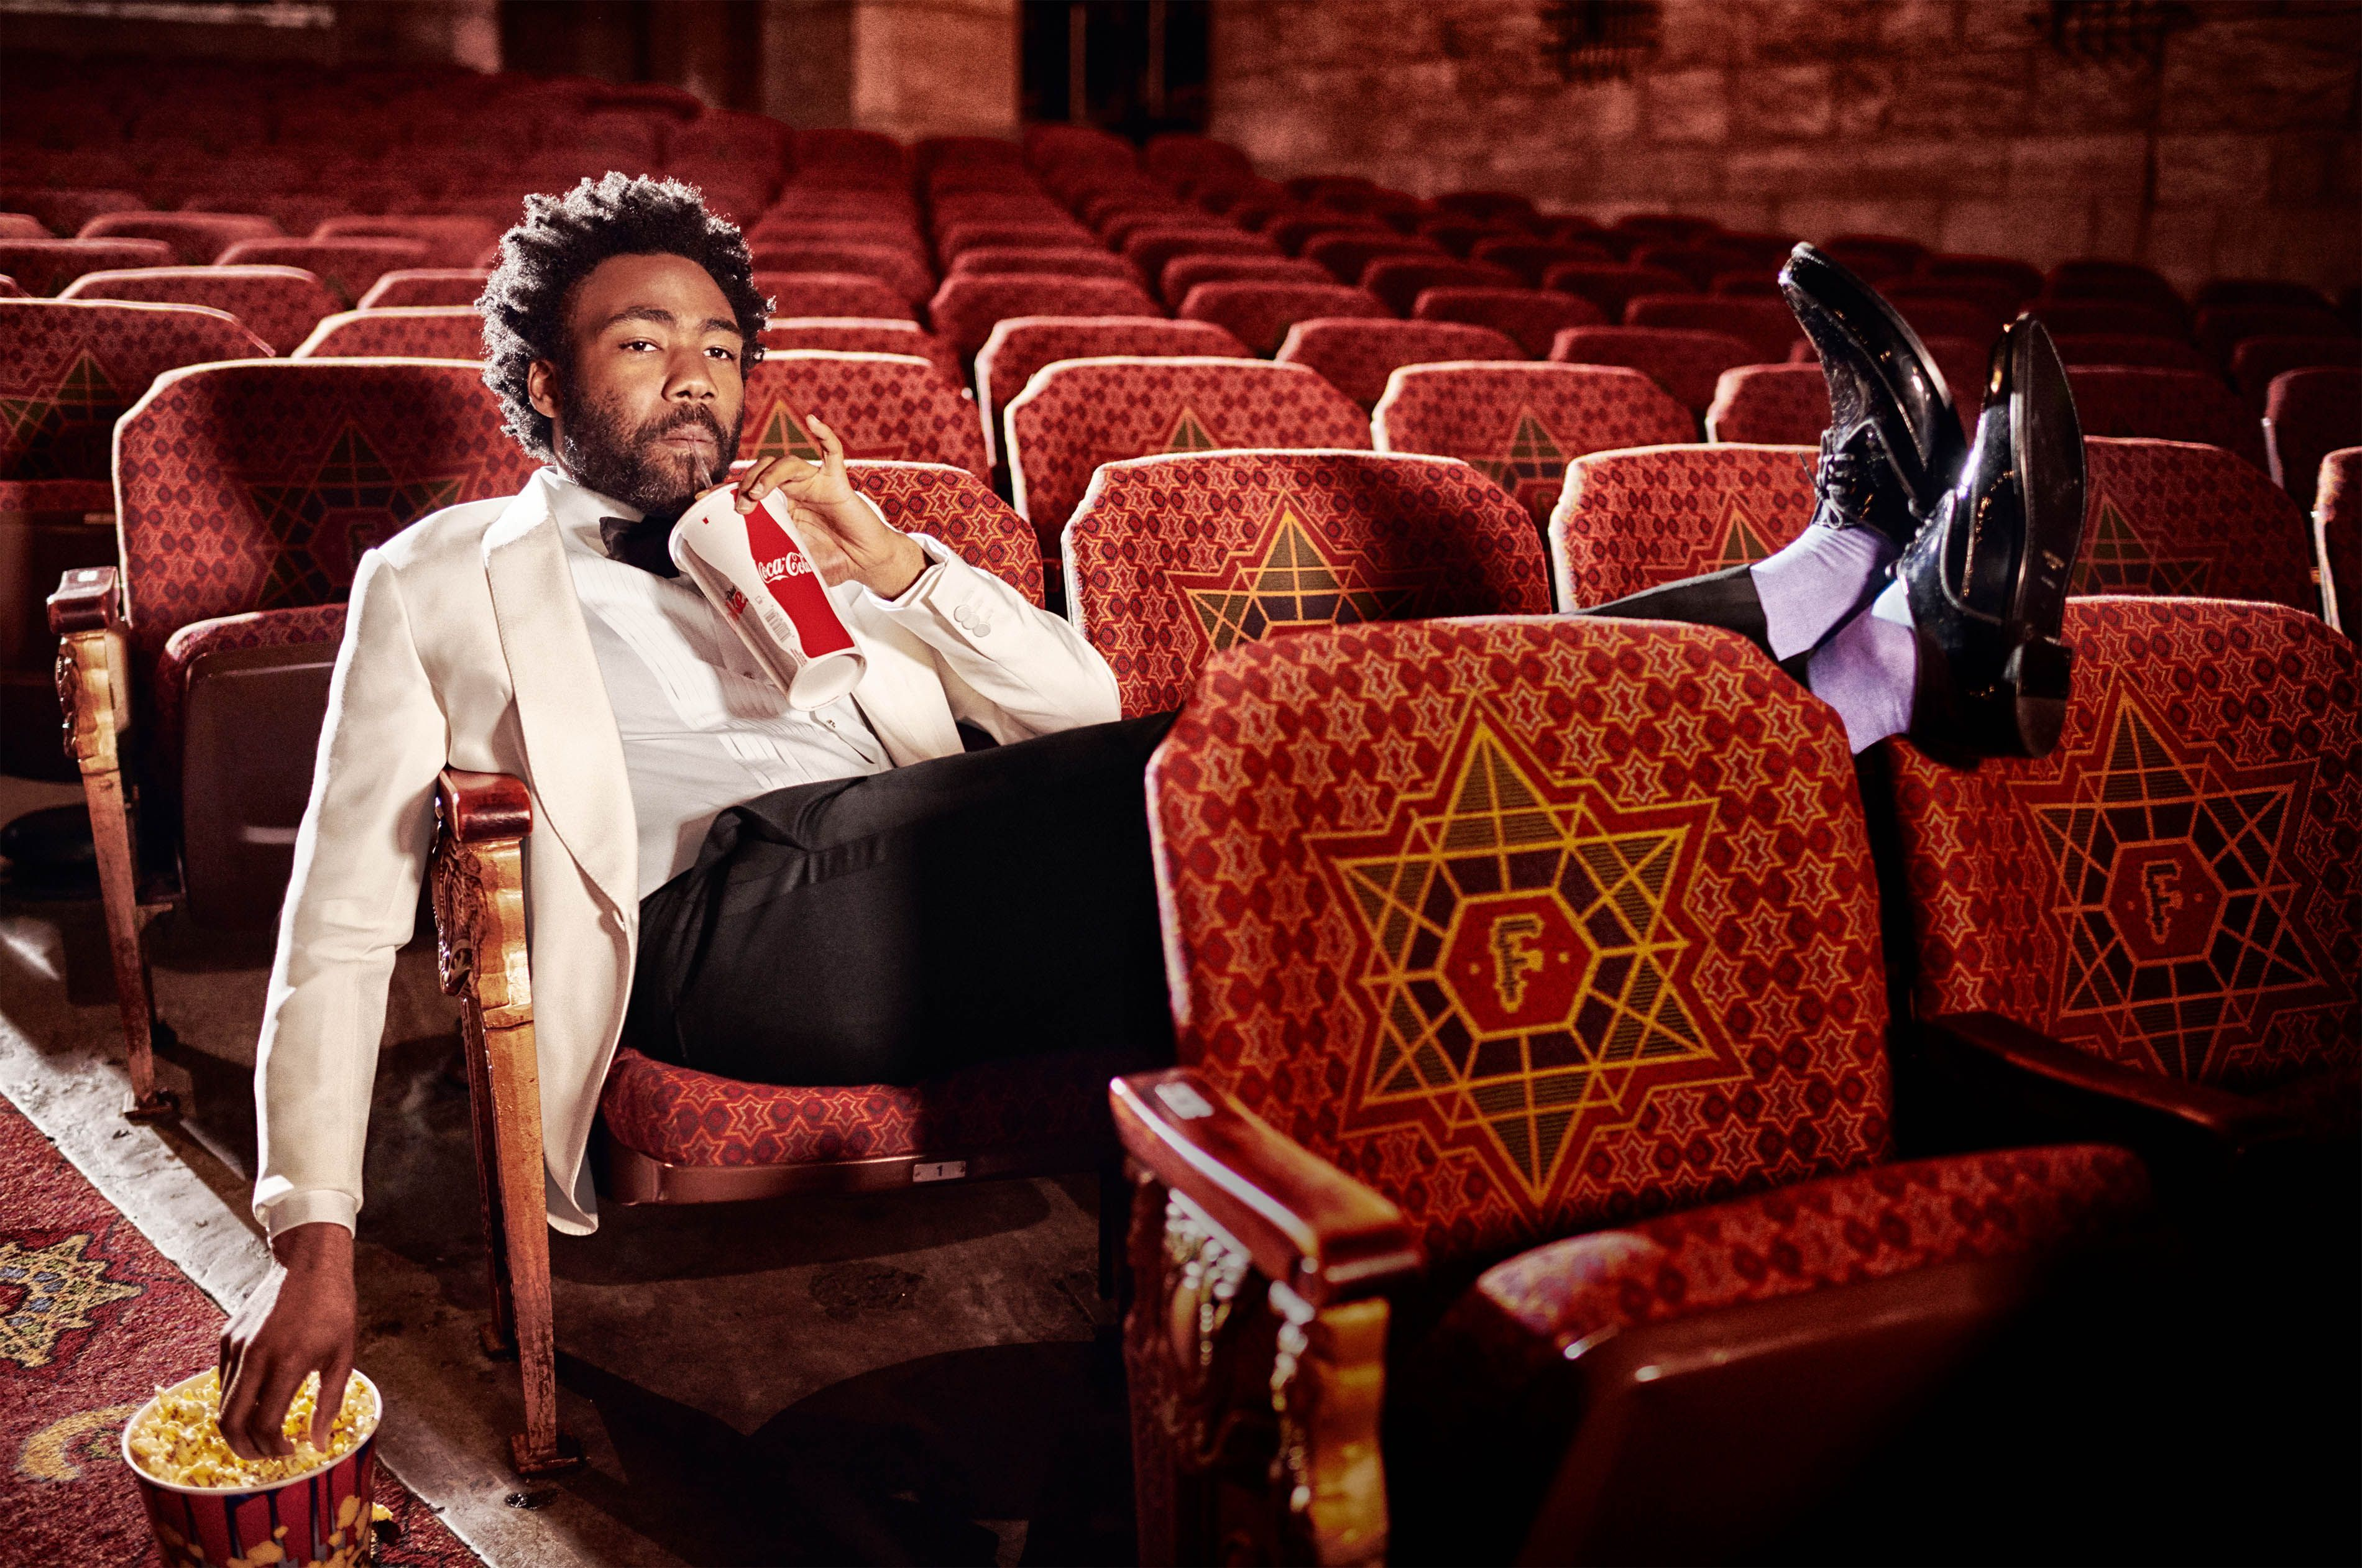 diễn viên - ca sĩ Donald Glover - Childish Gambino